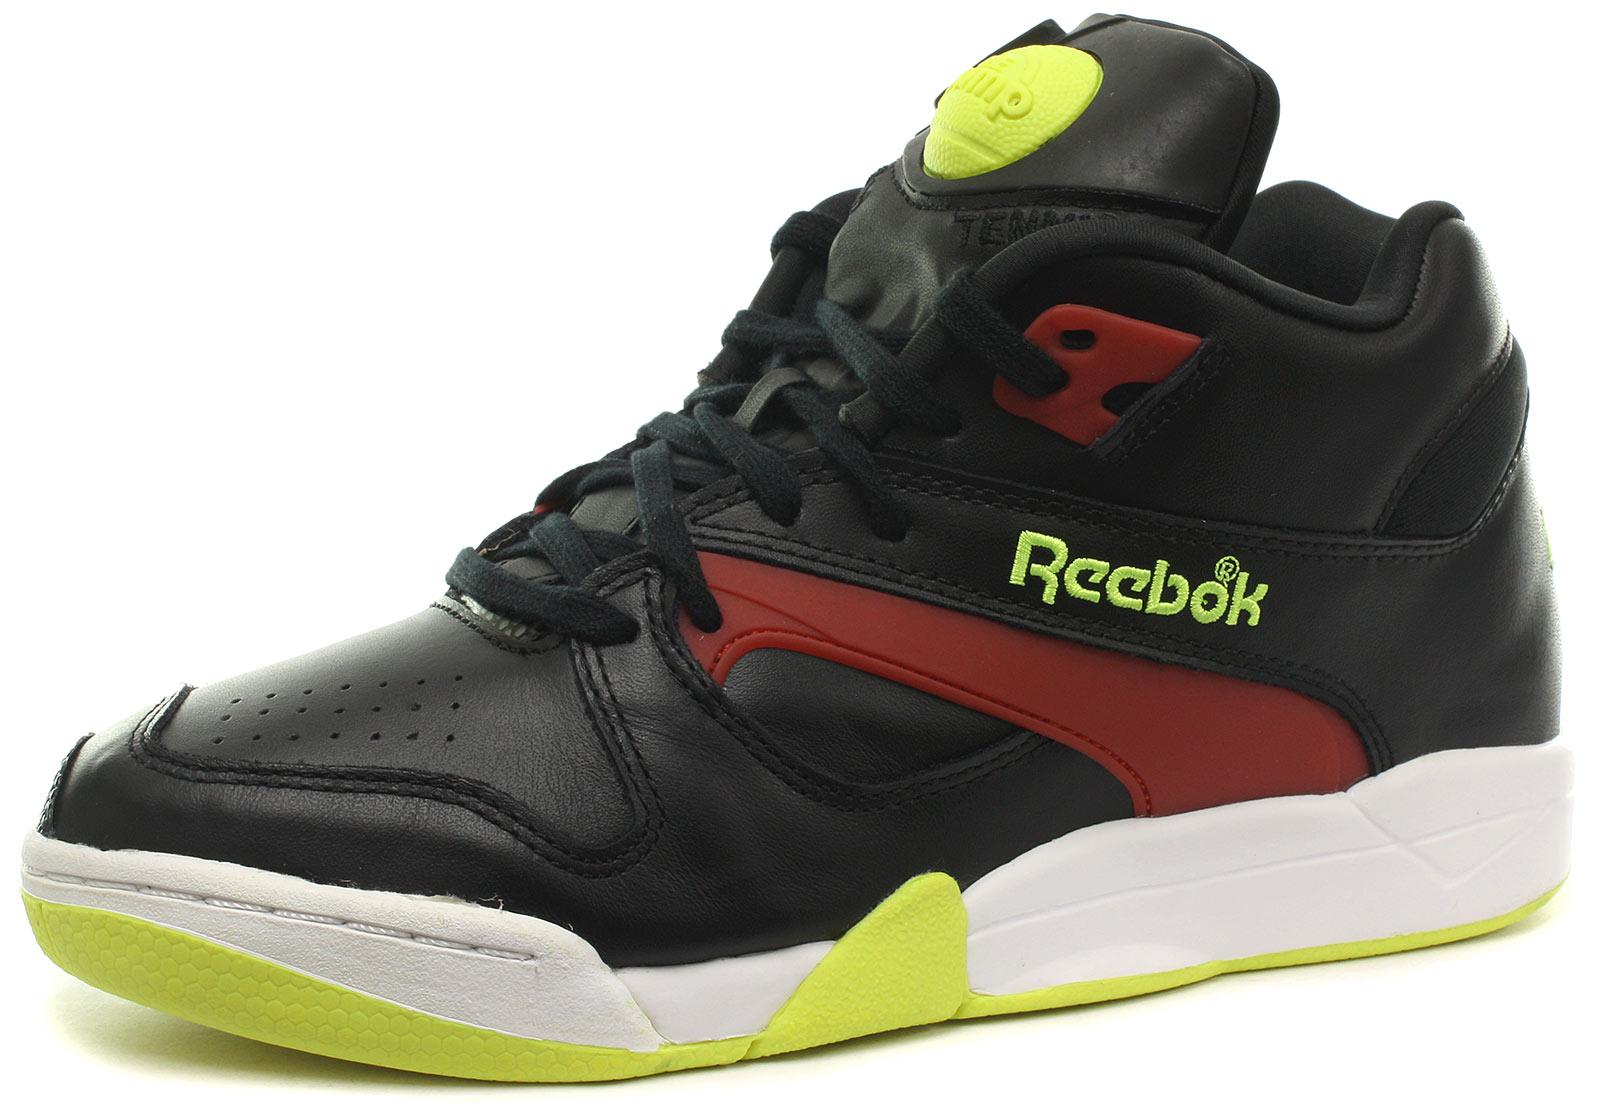 www.reebok.com/us/customer_service/returns_and_refunds Kqgq8cfax